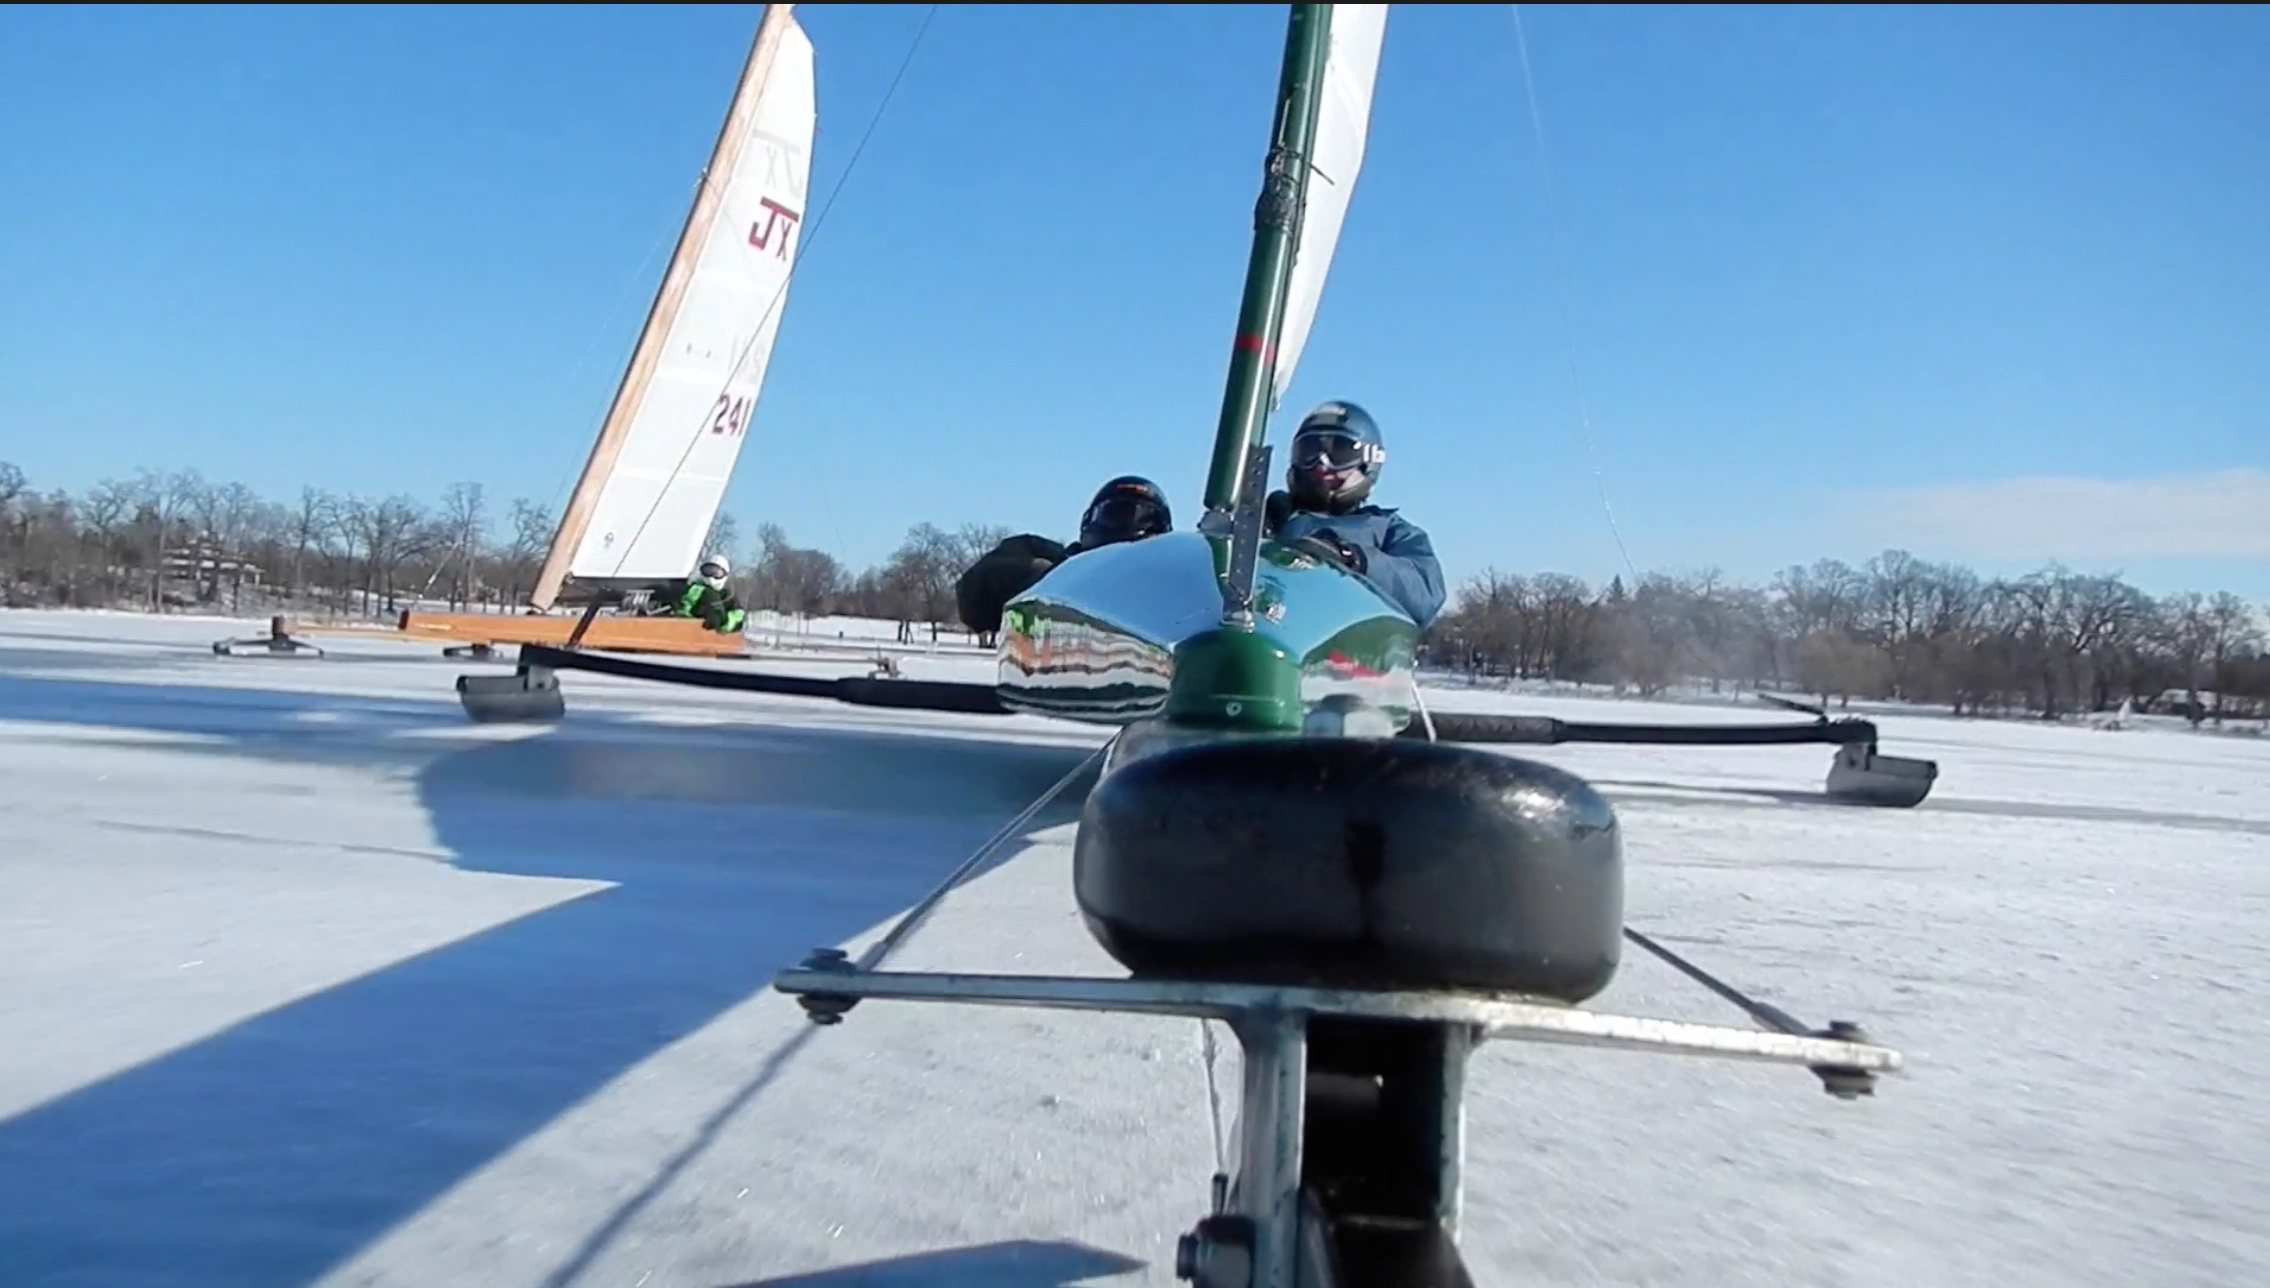 Lake Riley, Eden Prairie, MN 21-24-2012